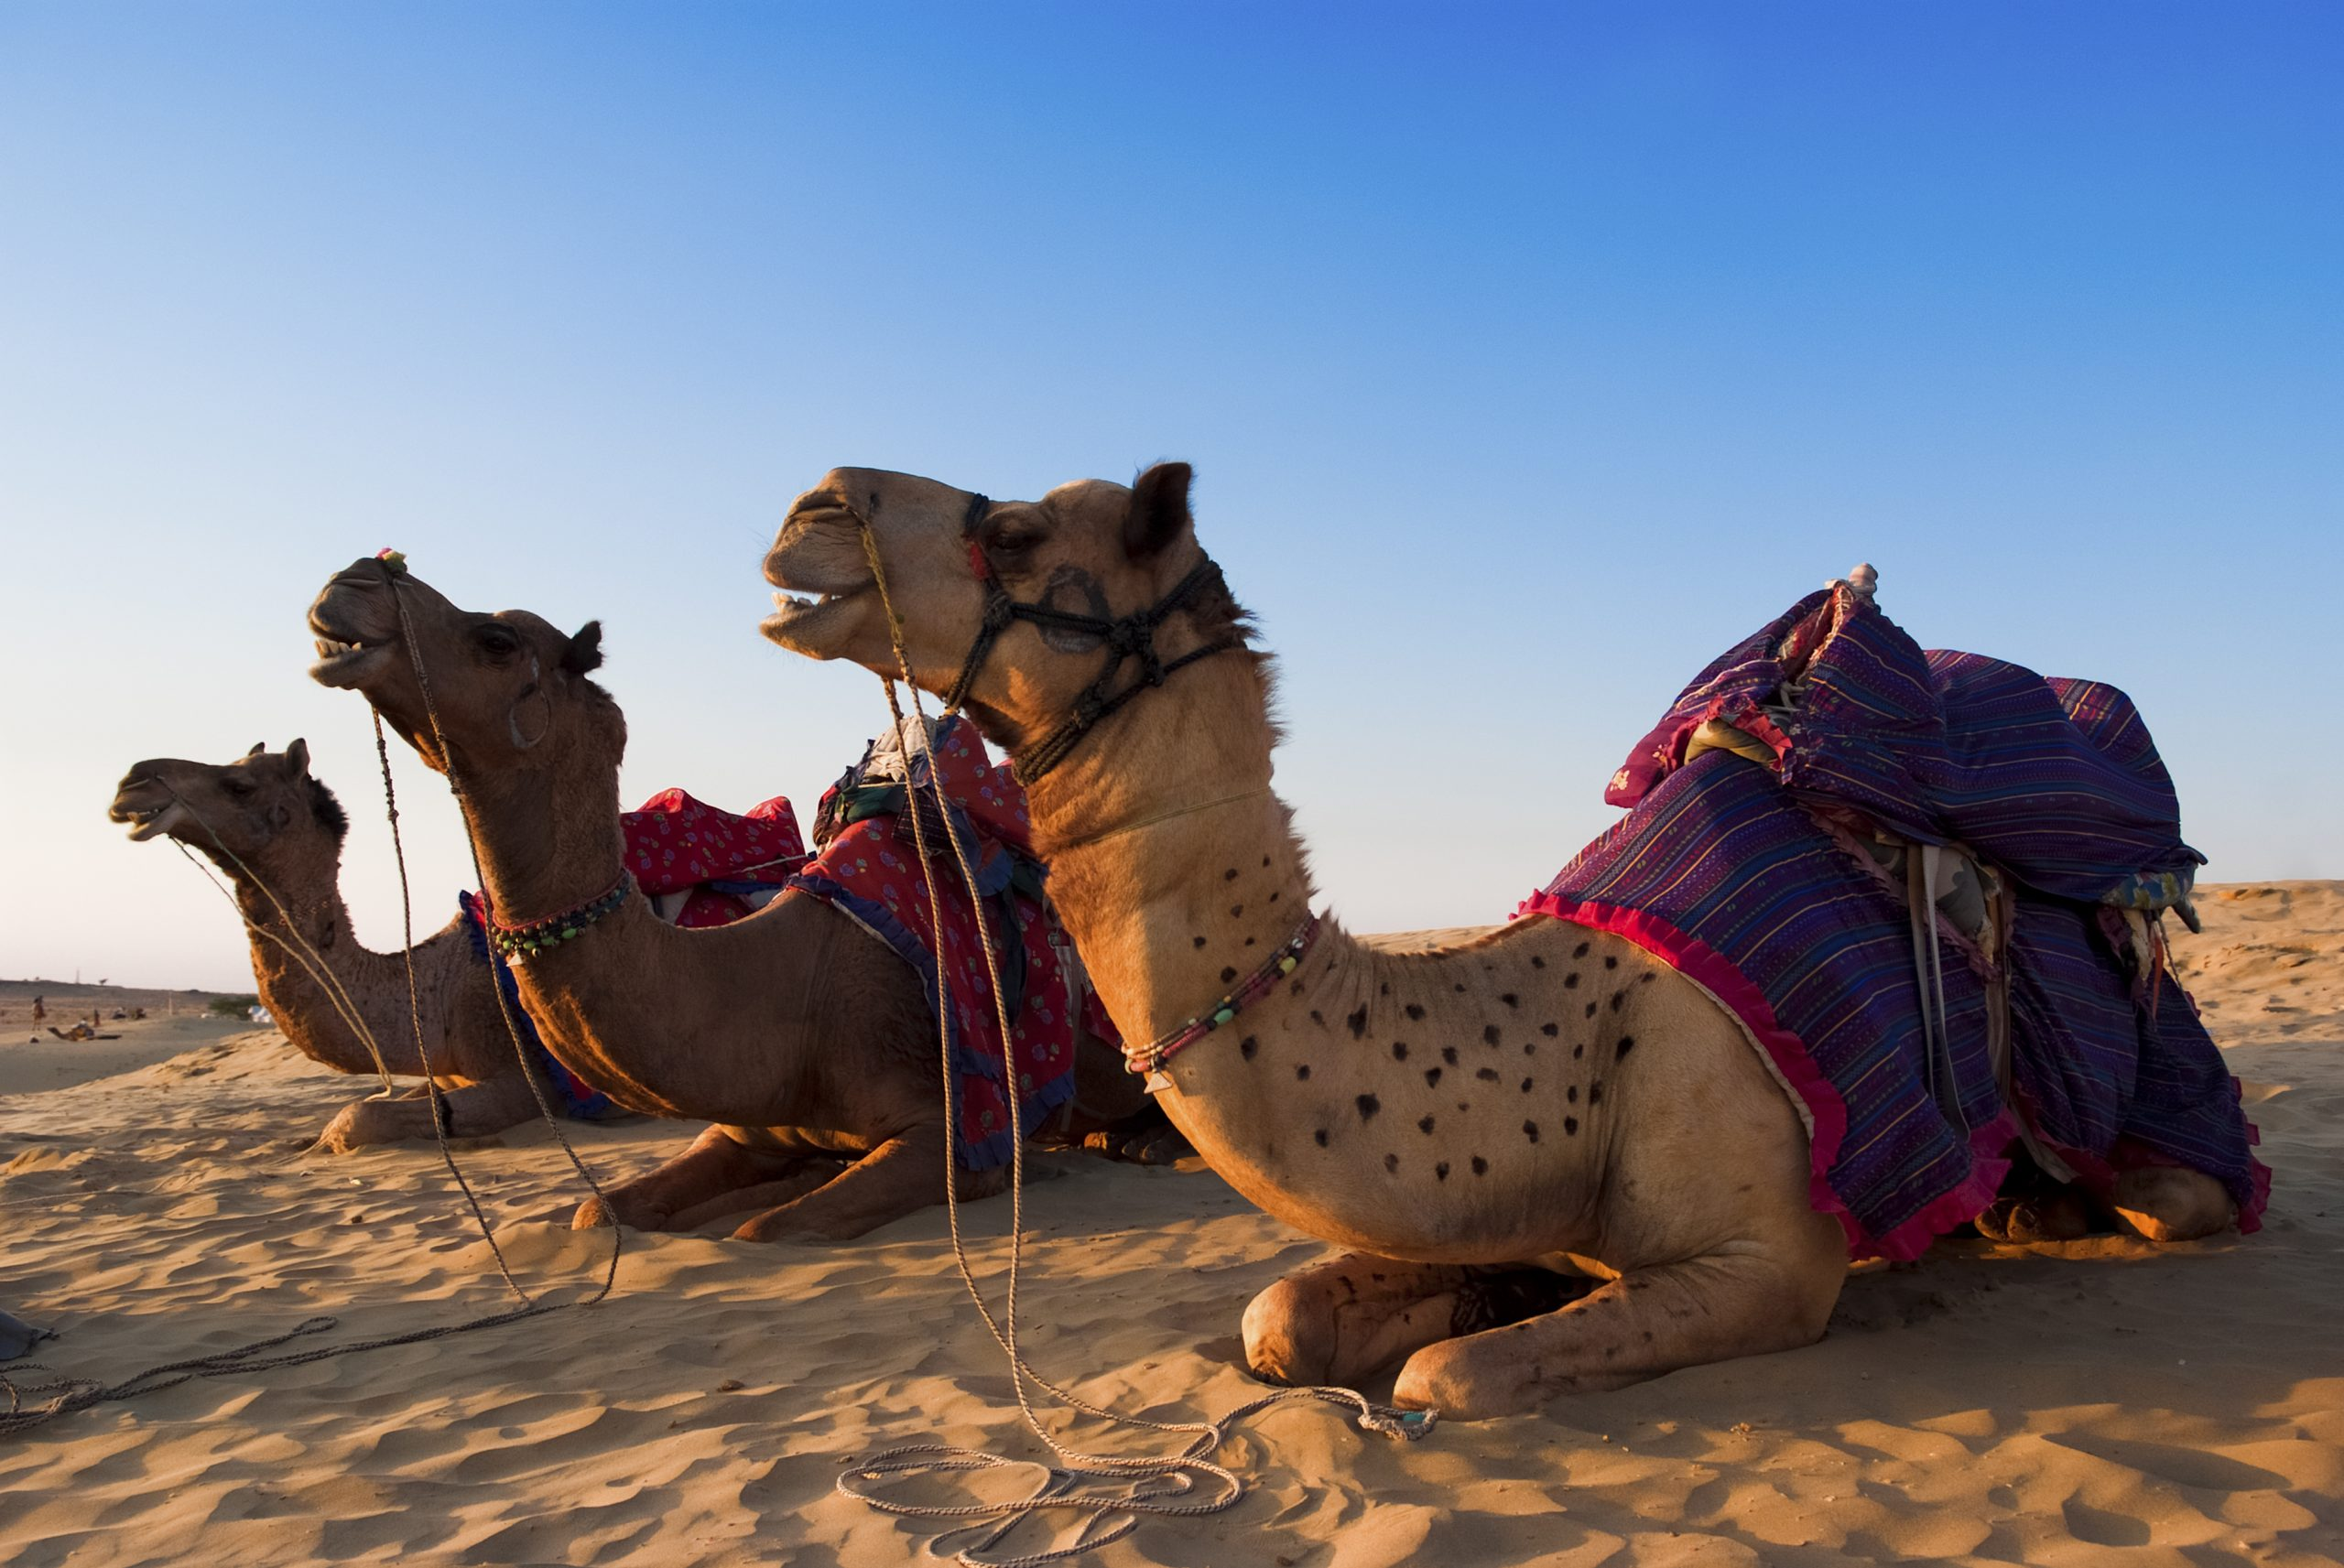 Woestijn Marokko- Kamelen